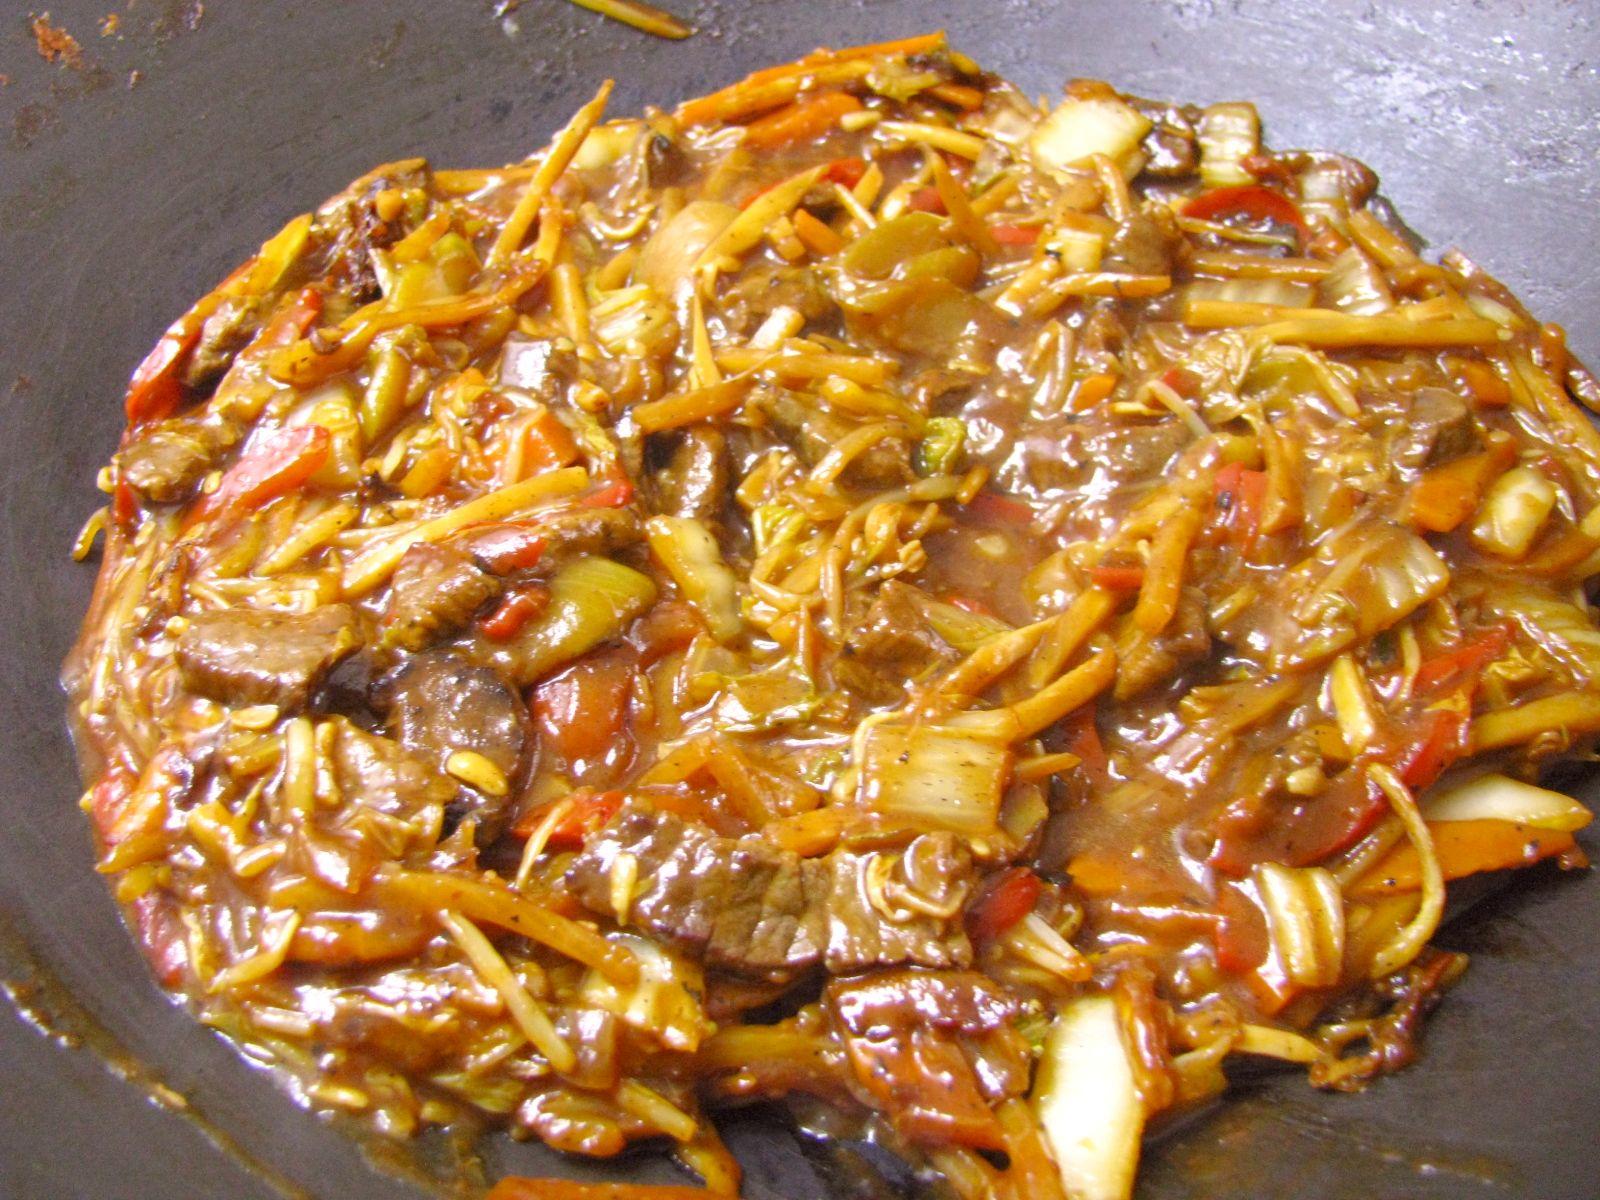 hovadzia cina vo woku